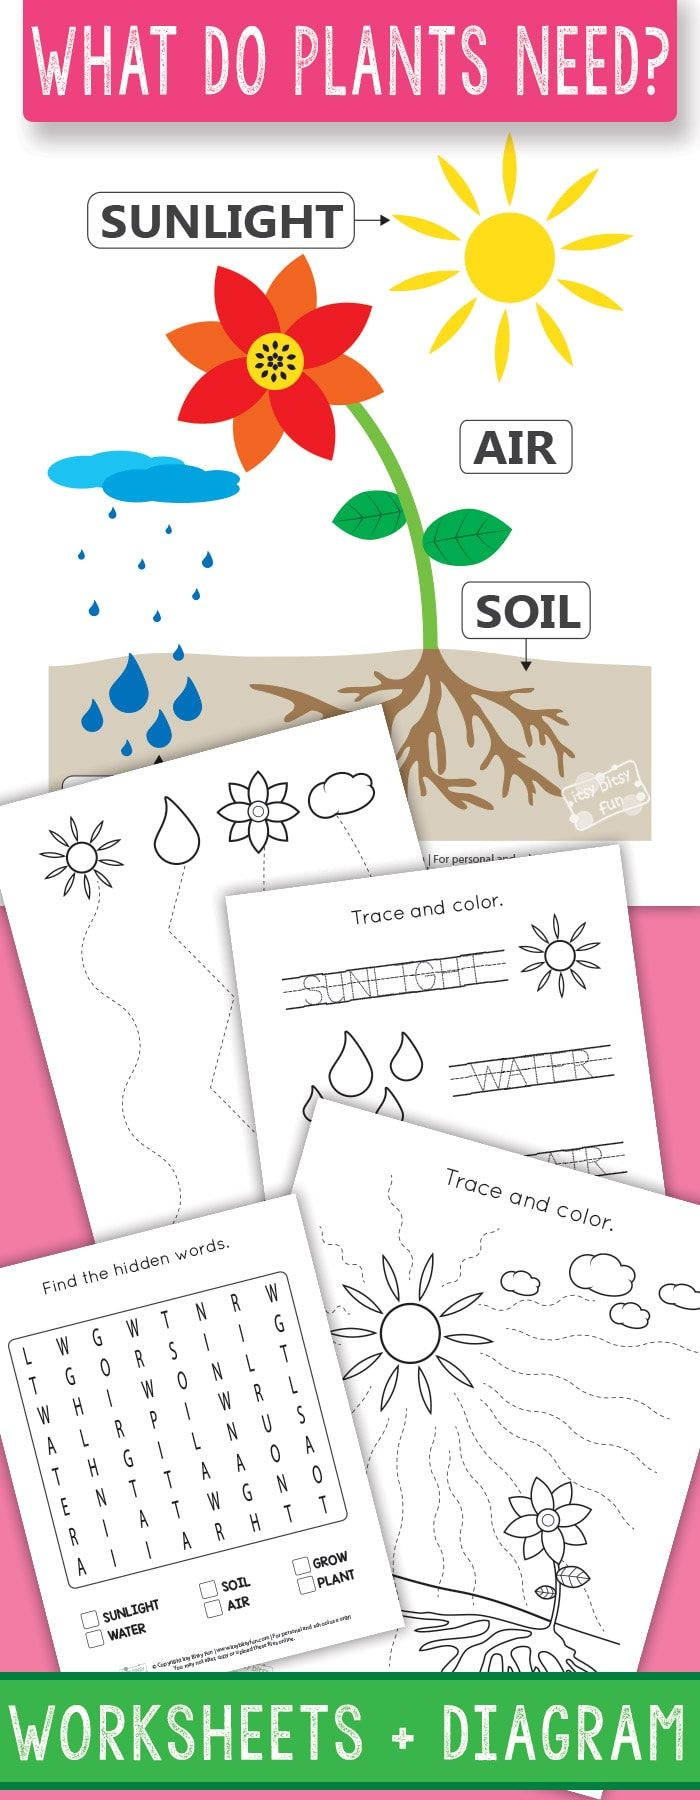 medium resolution of What do Plants Need to Grow Worksheets - itsybitsyfun.com   Plants  kindergarten